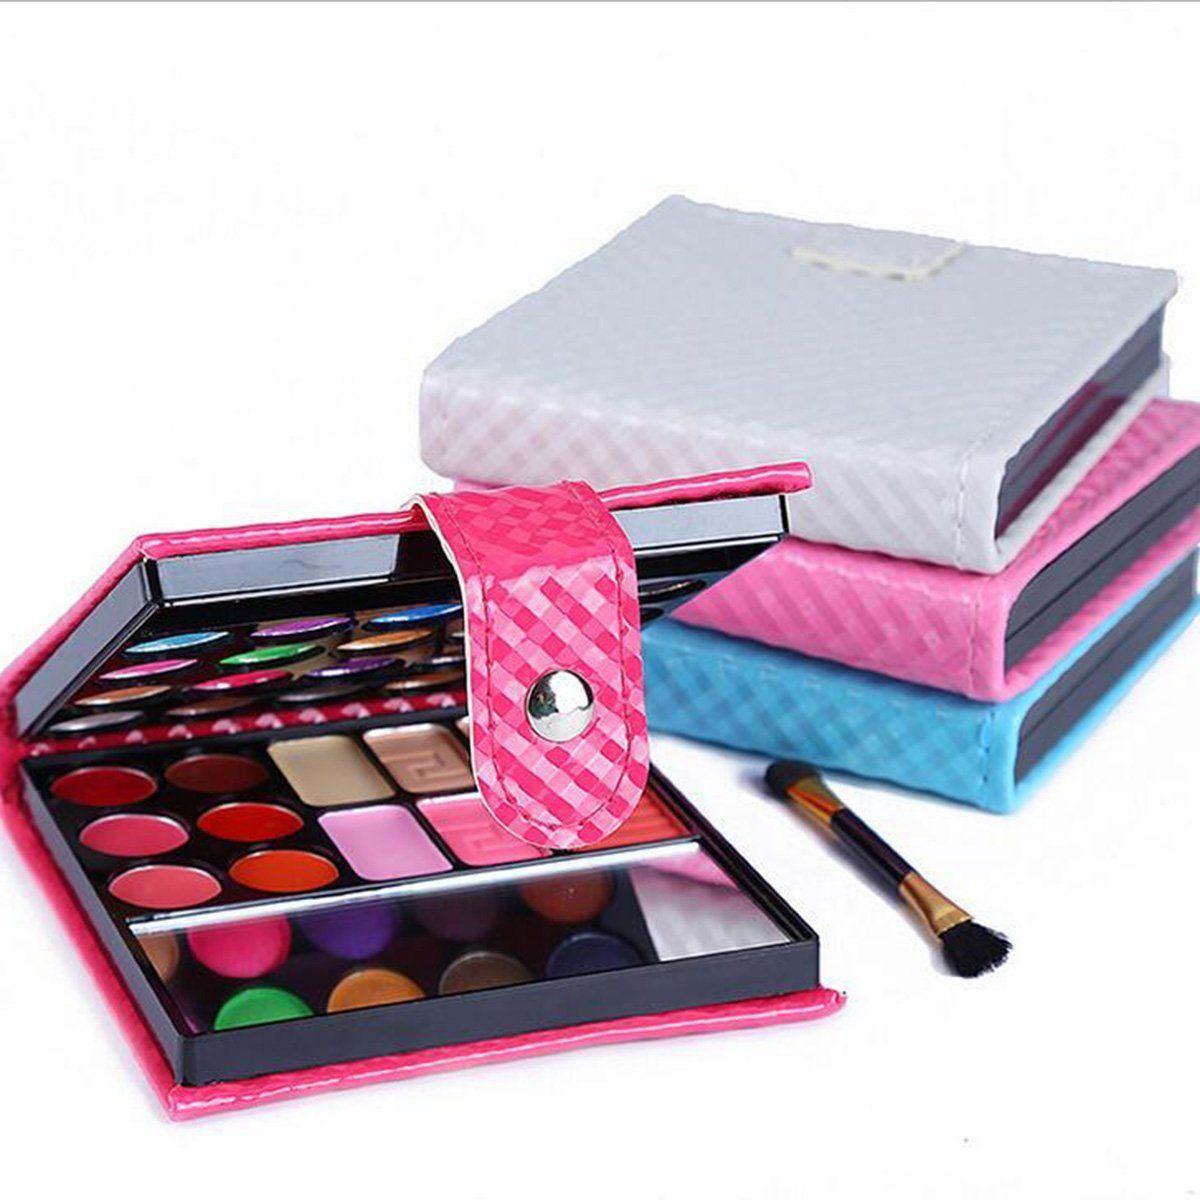 new 3 colors eyeshadow eye shadow palette makeup kit set make up box with mirror ebay. Black Bedroom Furniture Sets. Home Design Ideas